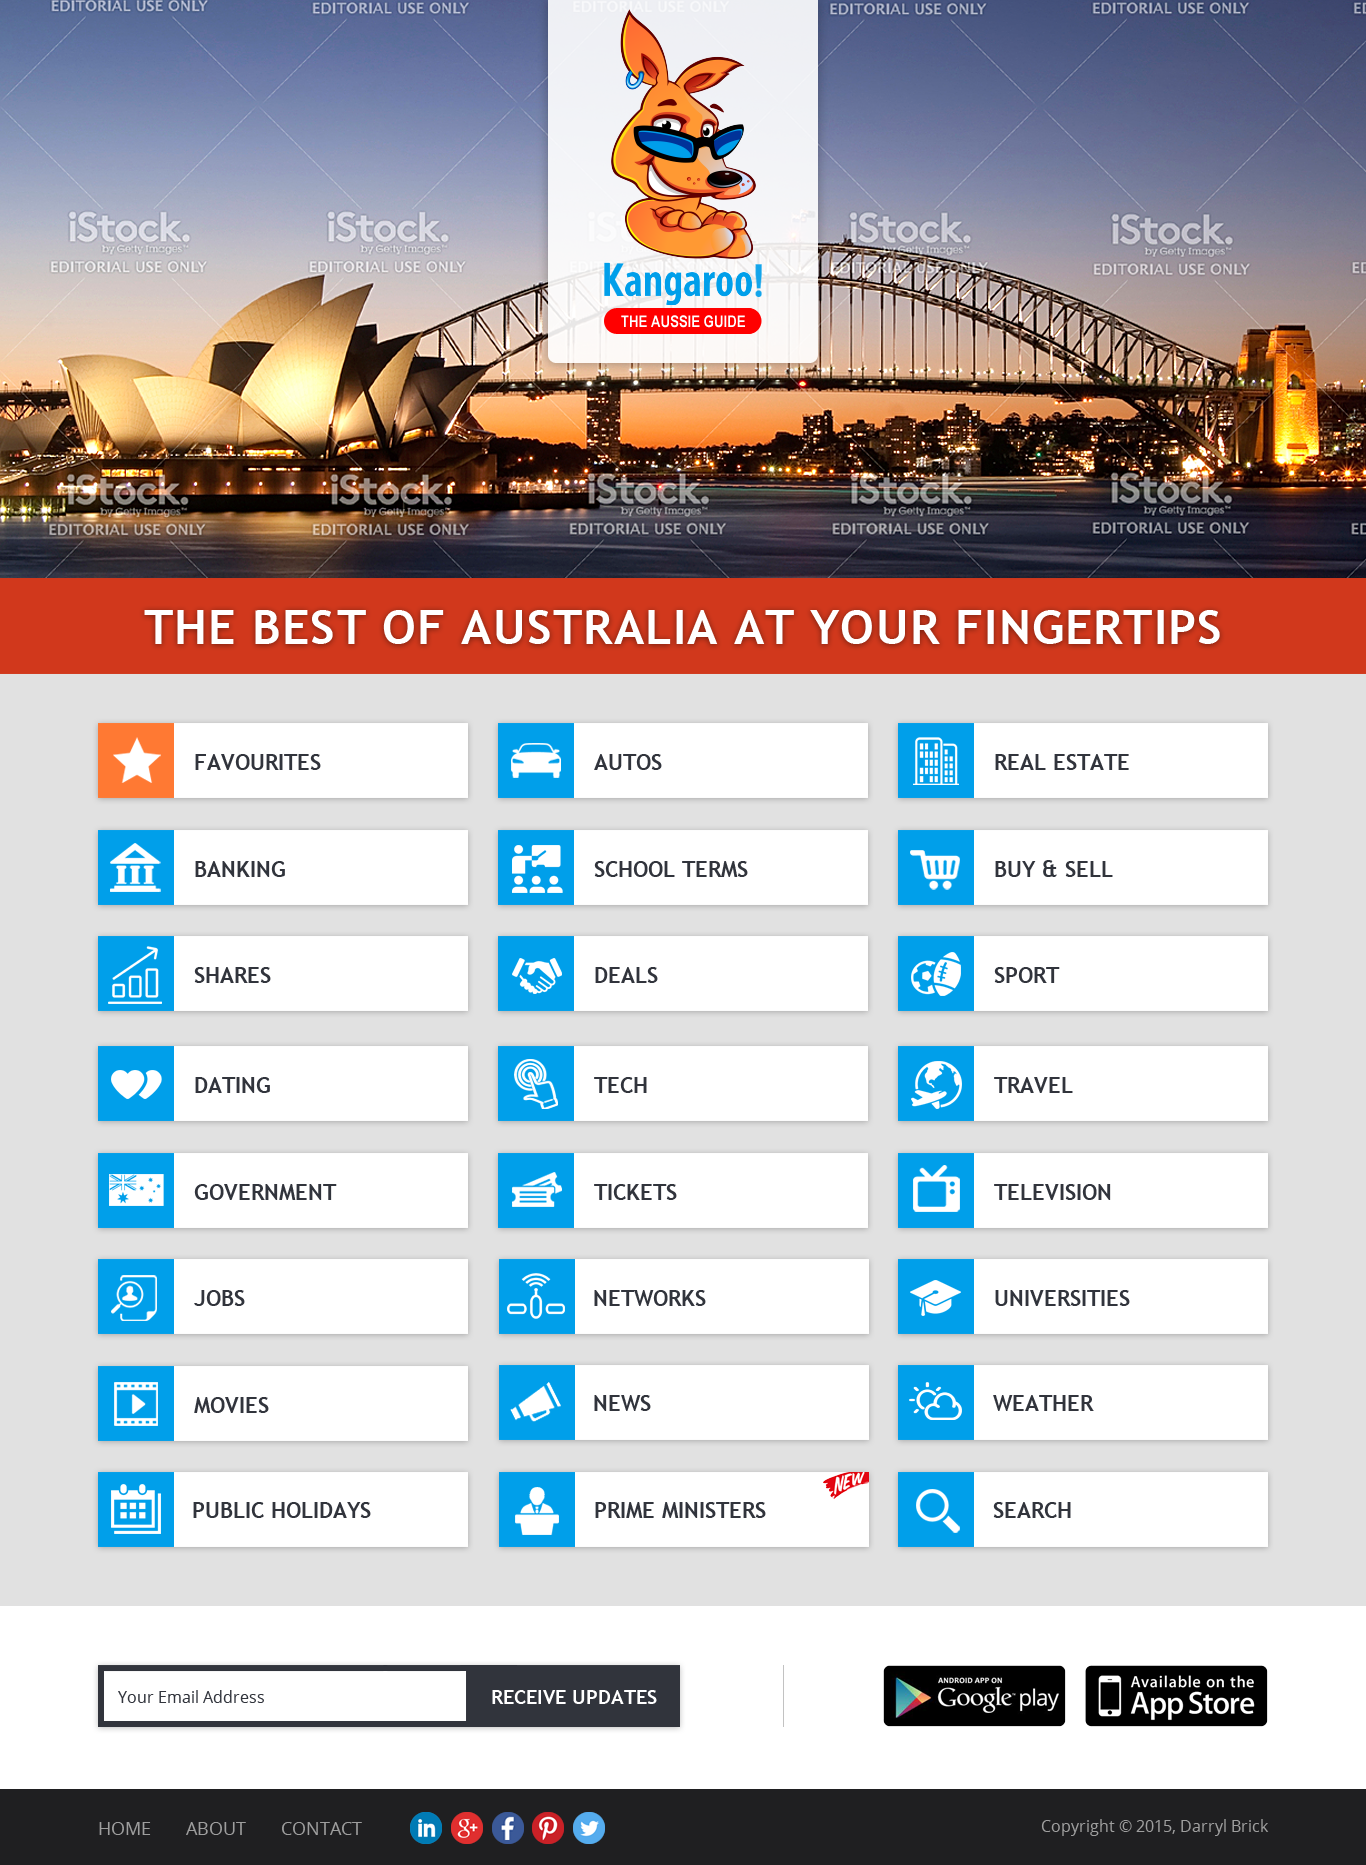 Kangaroo.com.au needs a facelift